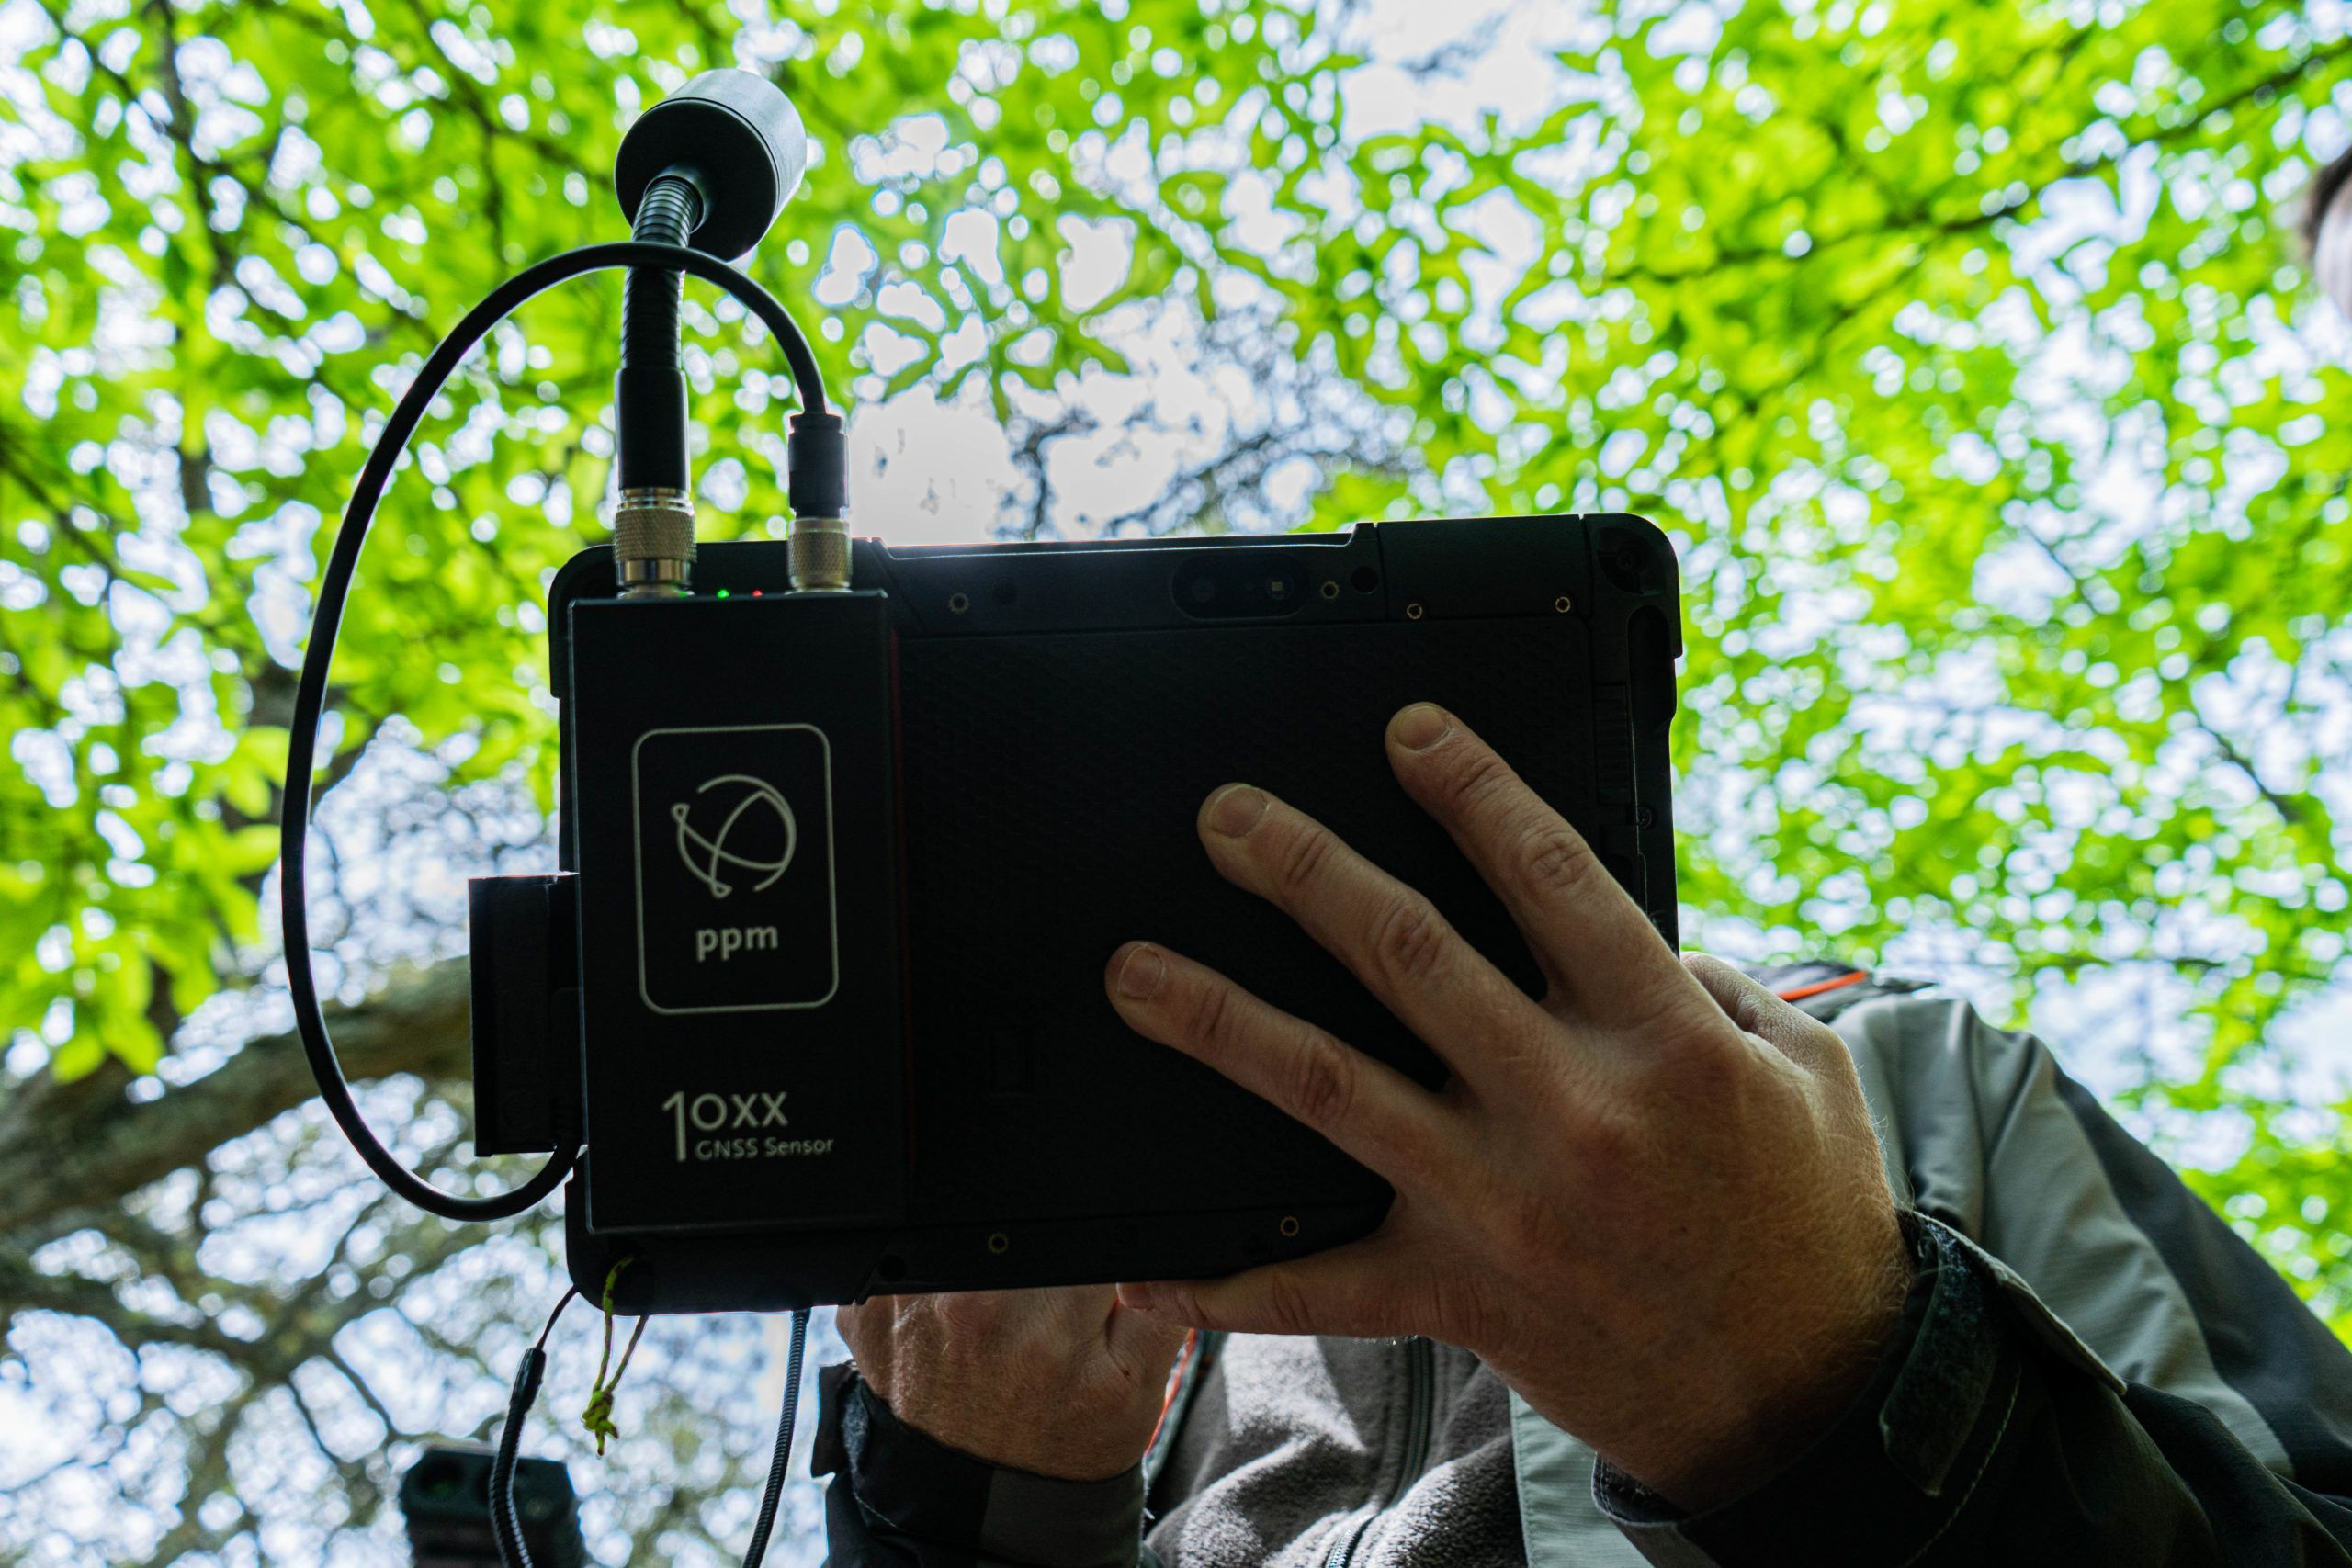 GPS PPM 10X adherido a una tablet Getac, Field-Map Mobile GIS, medir terrenos, medir parcelas